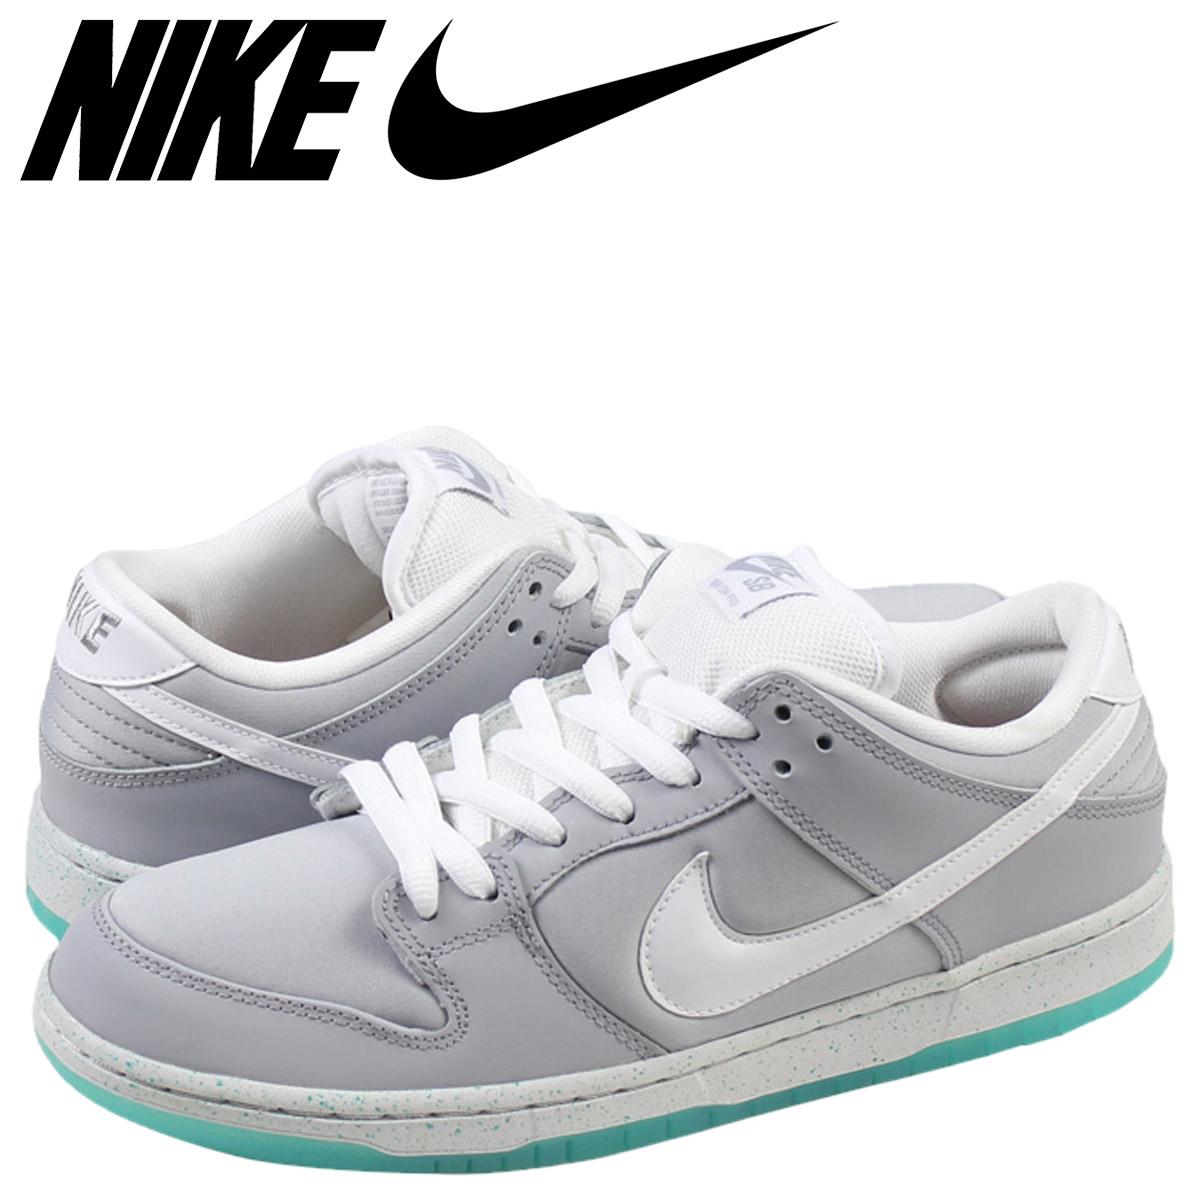 pretty nice 1c5d5 22320 NIKE Nike dunk sneakers DUNK LOW PRO SB AIR MAG dunk low pro air mug  313,170-022 gray men